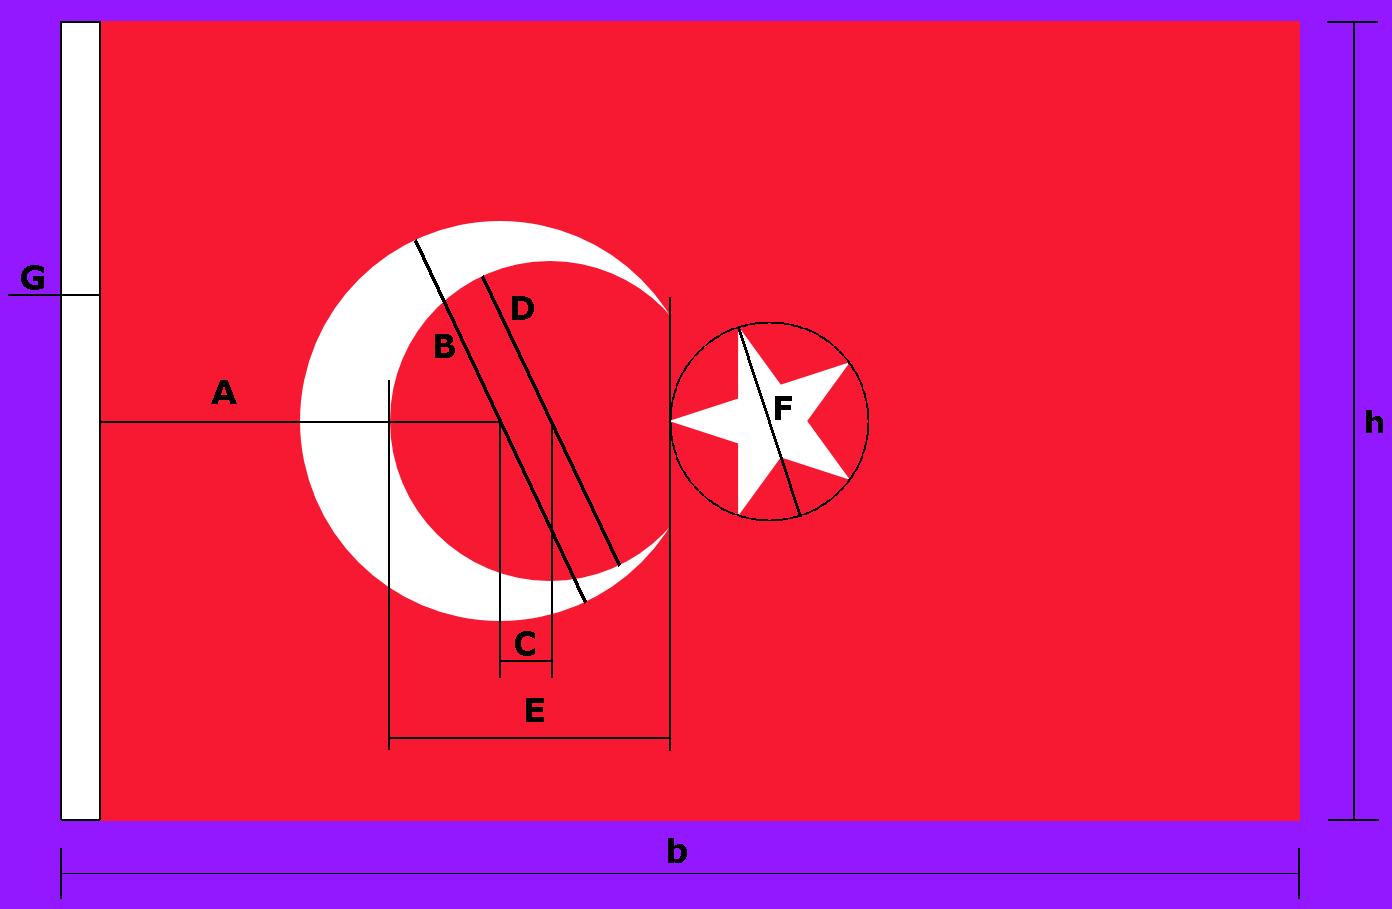 flagge der türkei – wikipedia